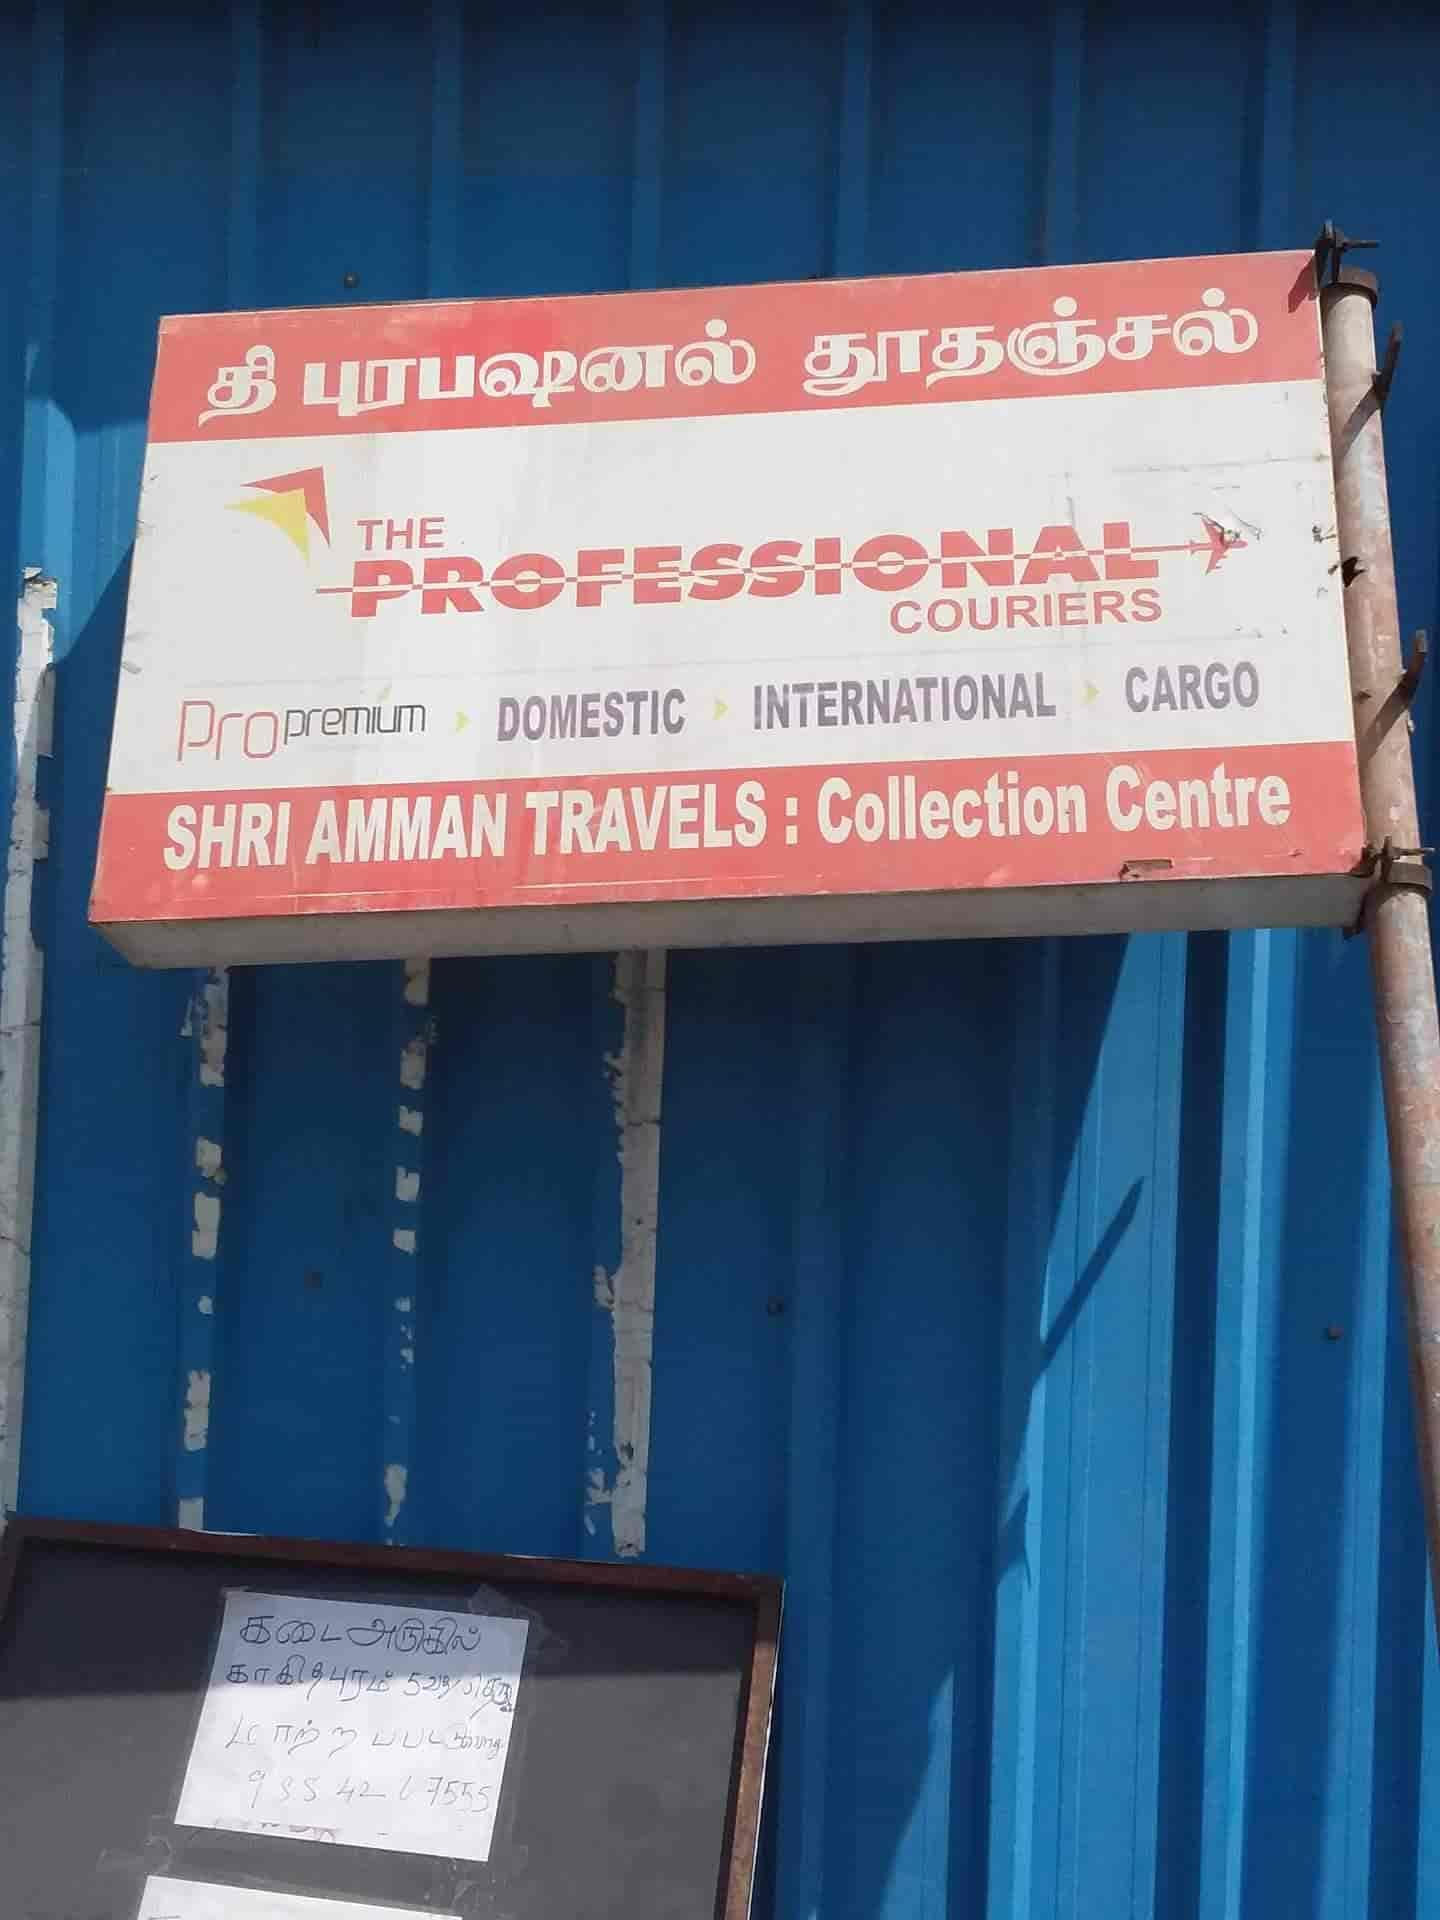 Sri Amman Call Taxi Travels Photos, S Kolathur, Chennai